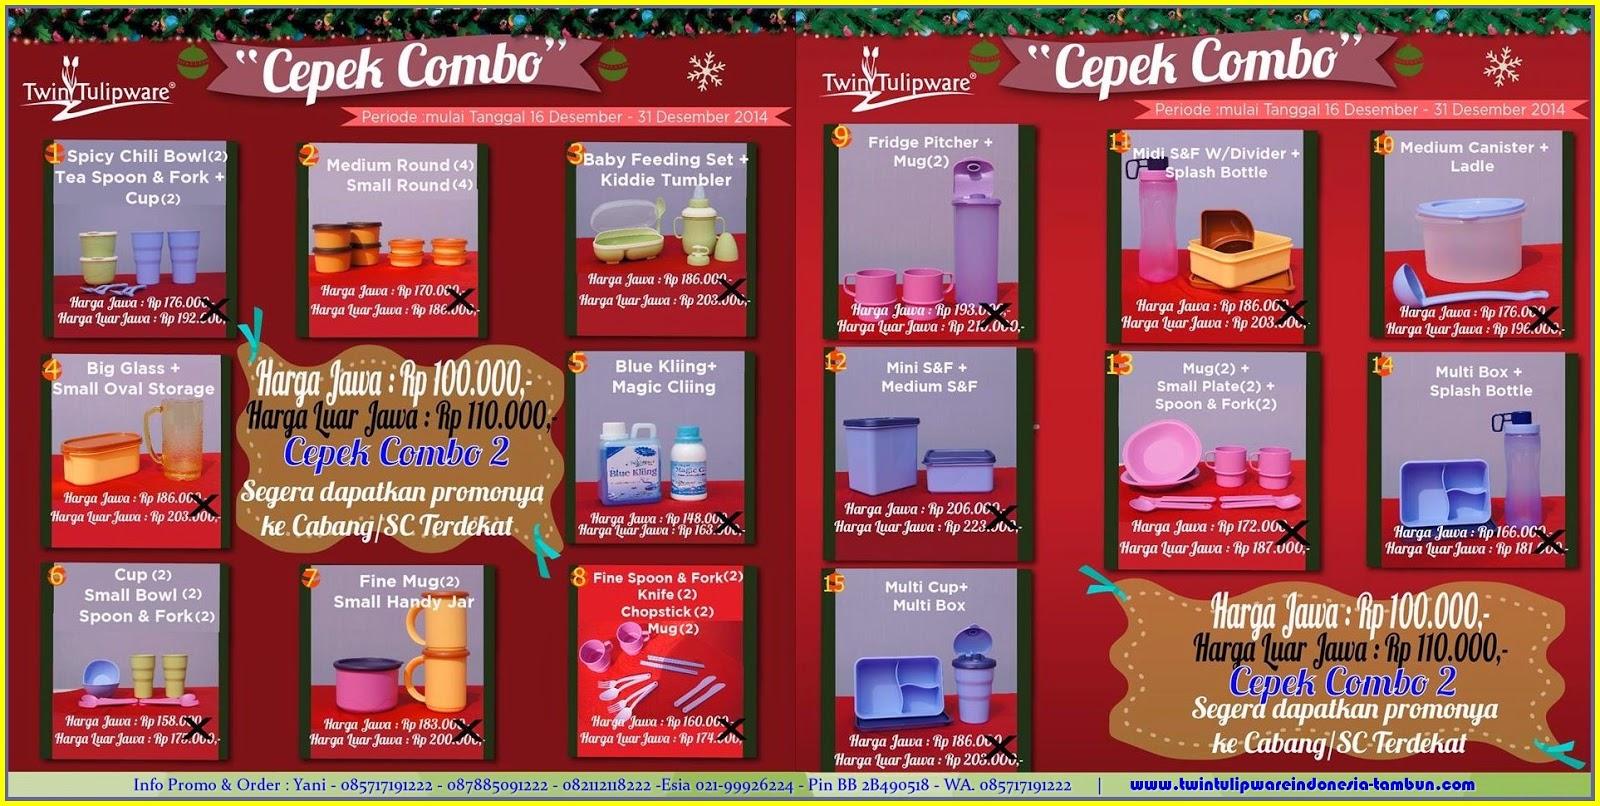 Promo CEPEK COMBO-2 Tulipware Desember 2014